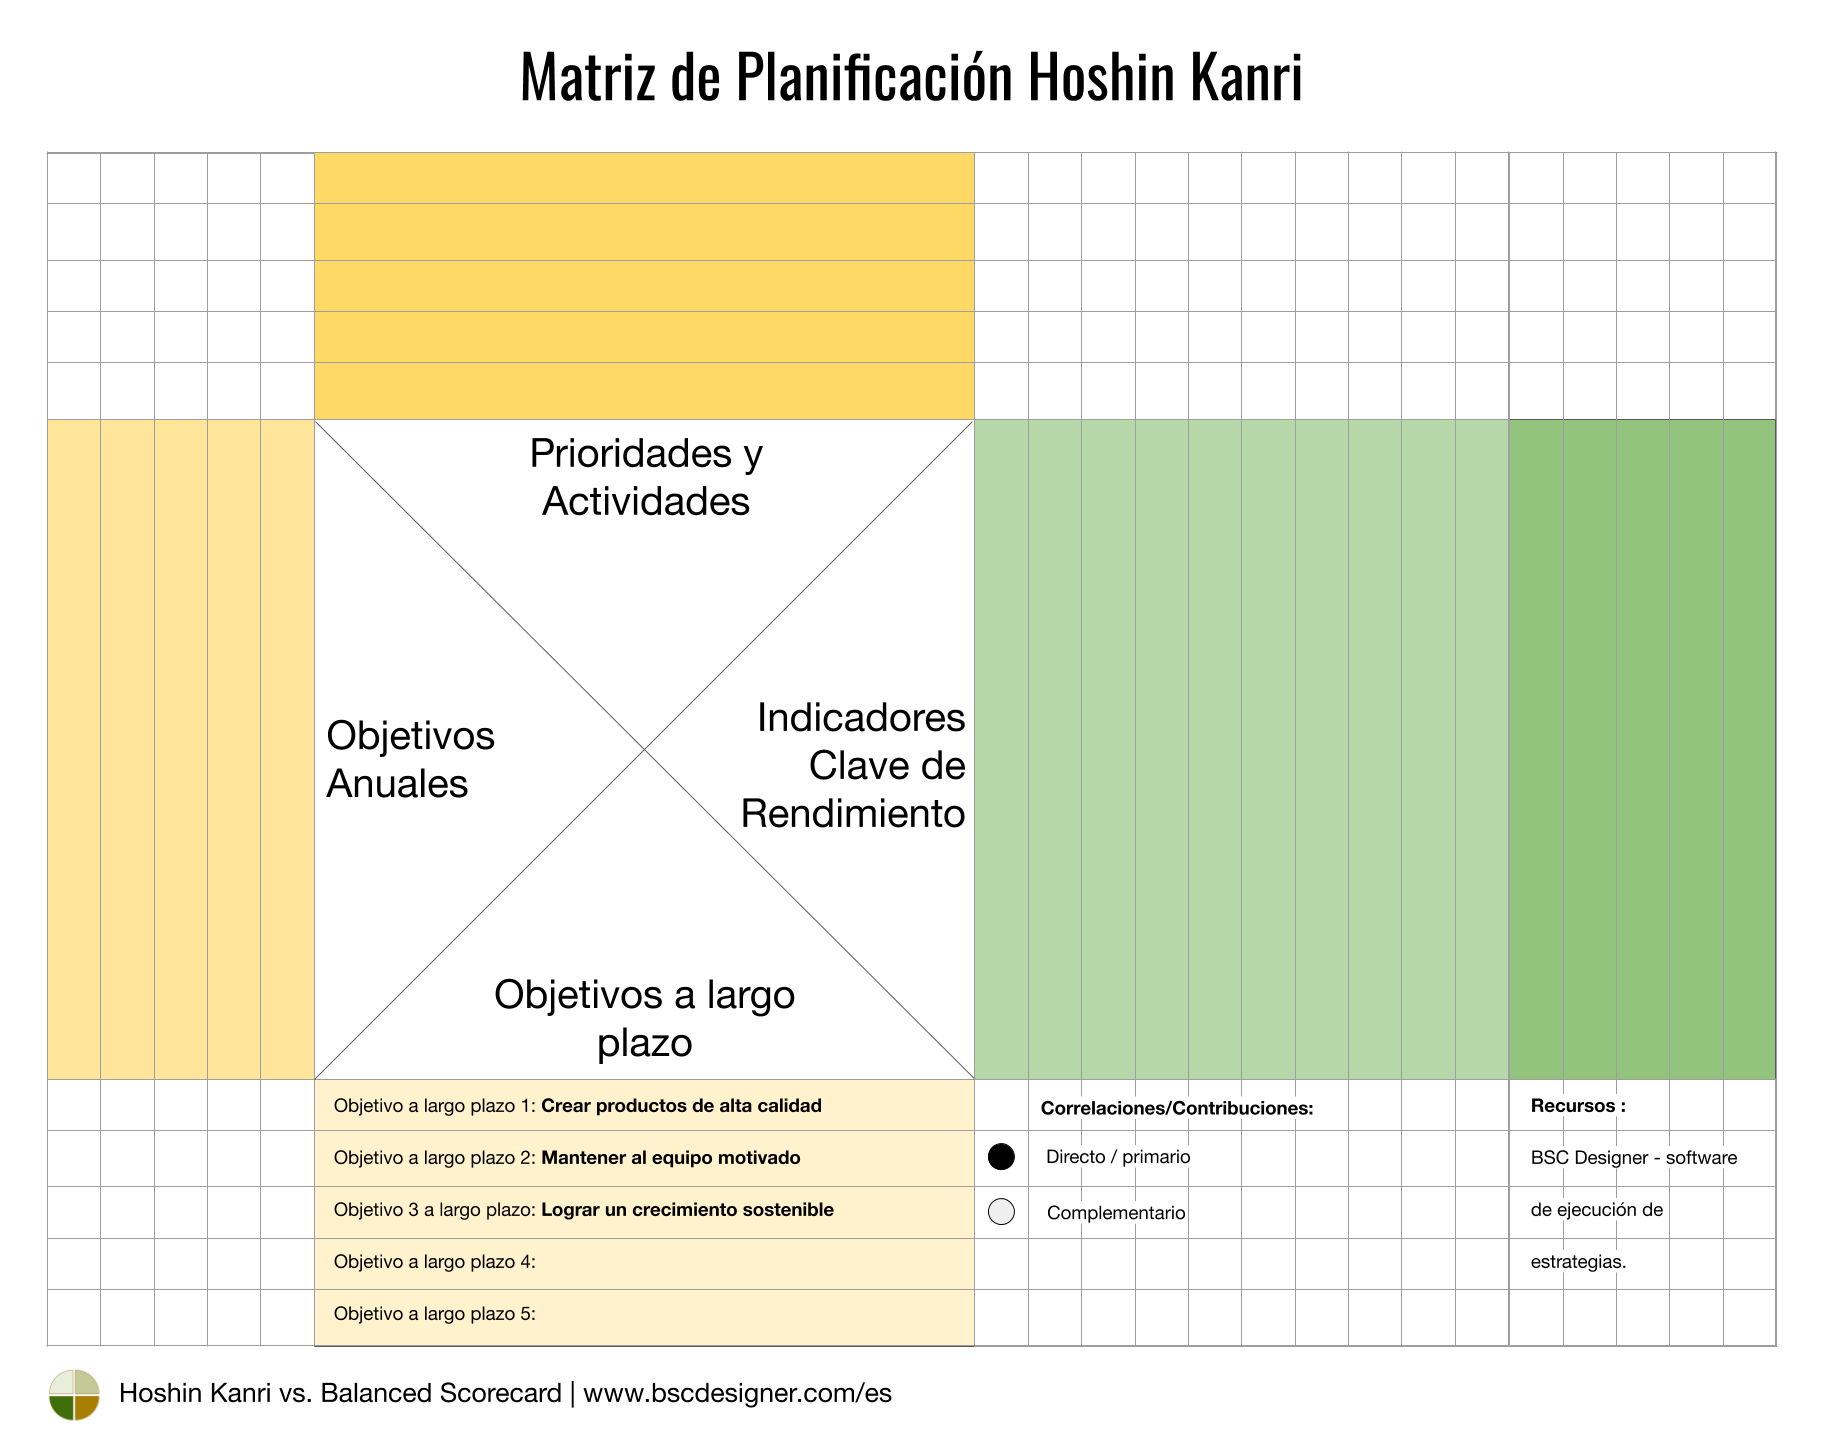 Matriz Hoshin Kanri - Objetivos a largo plazo